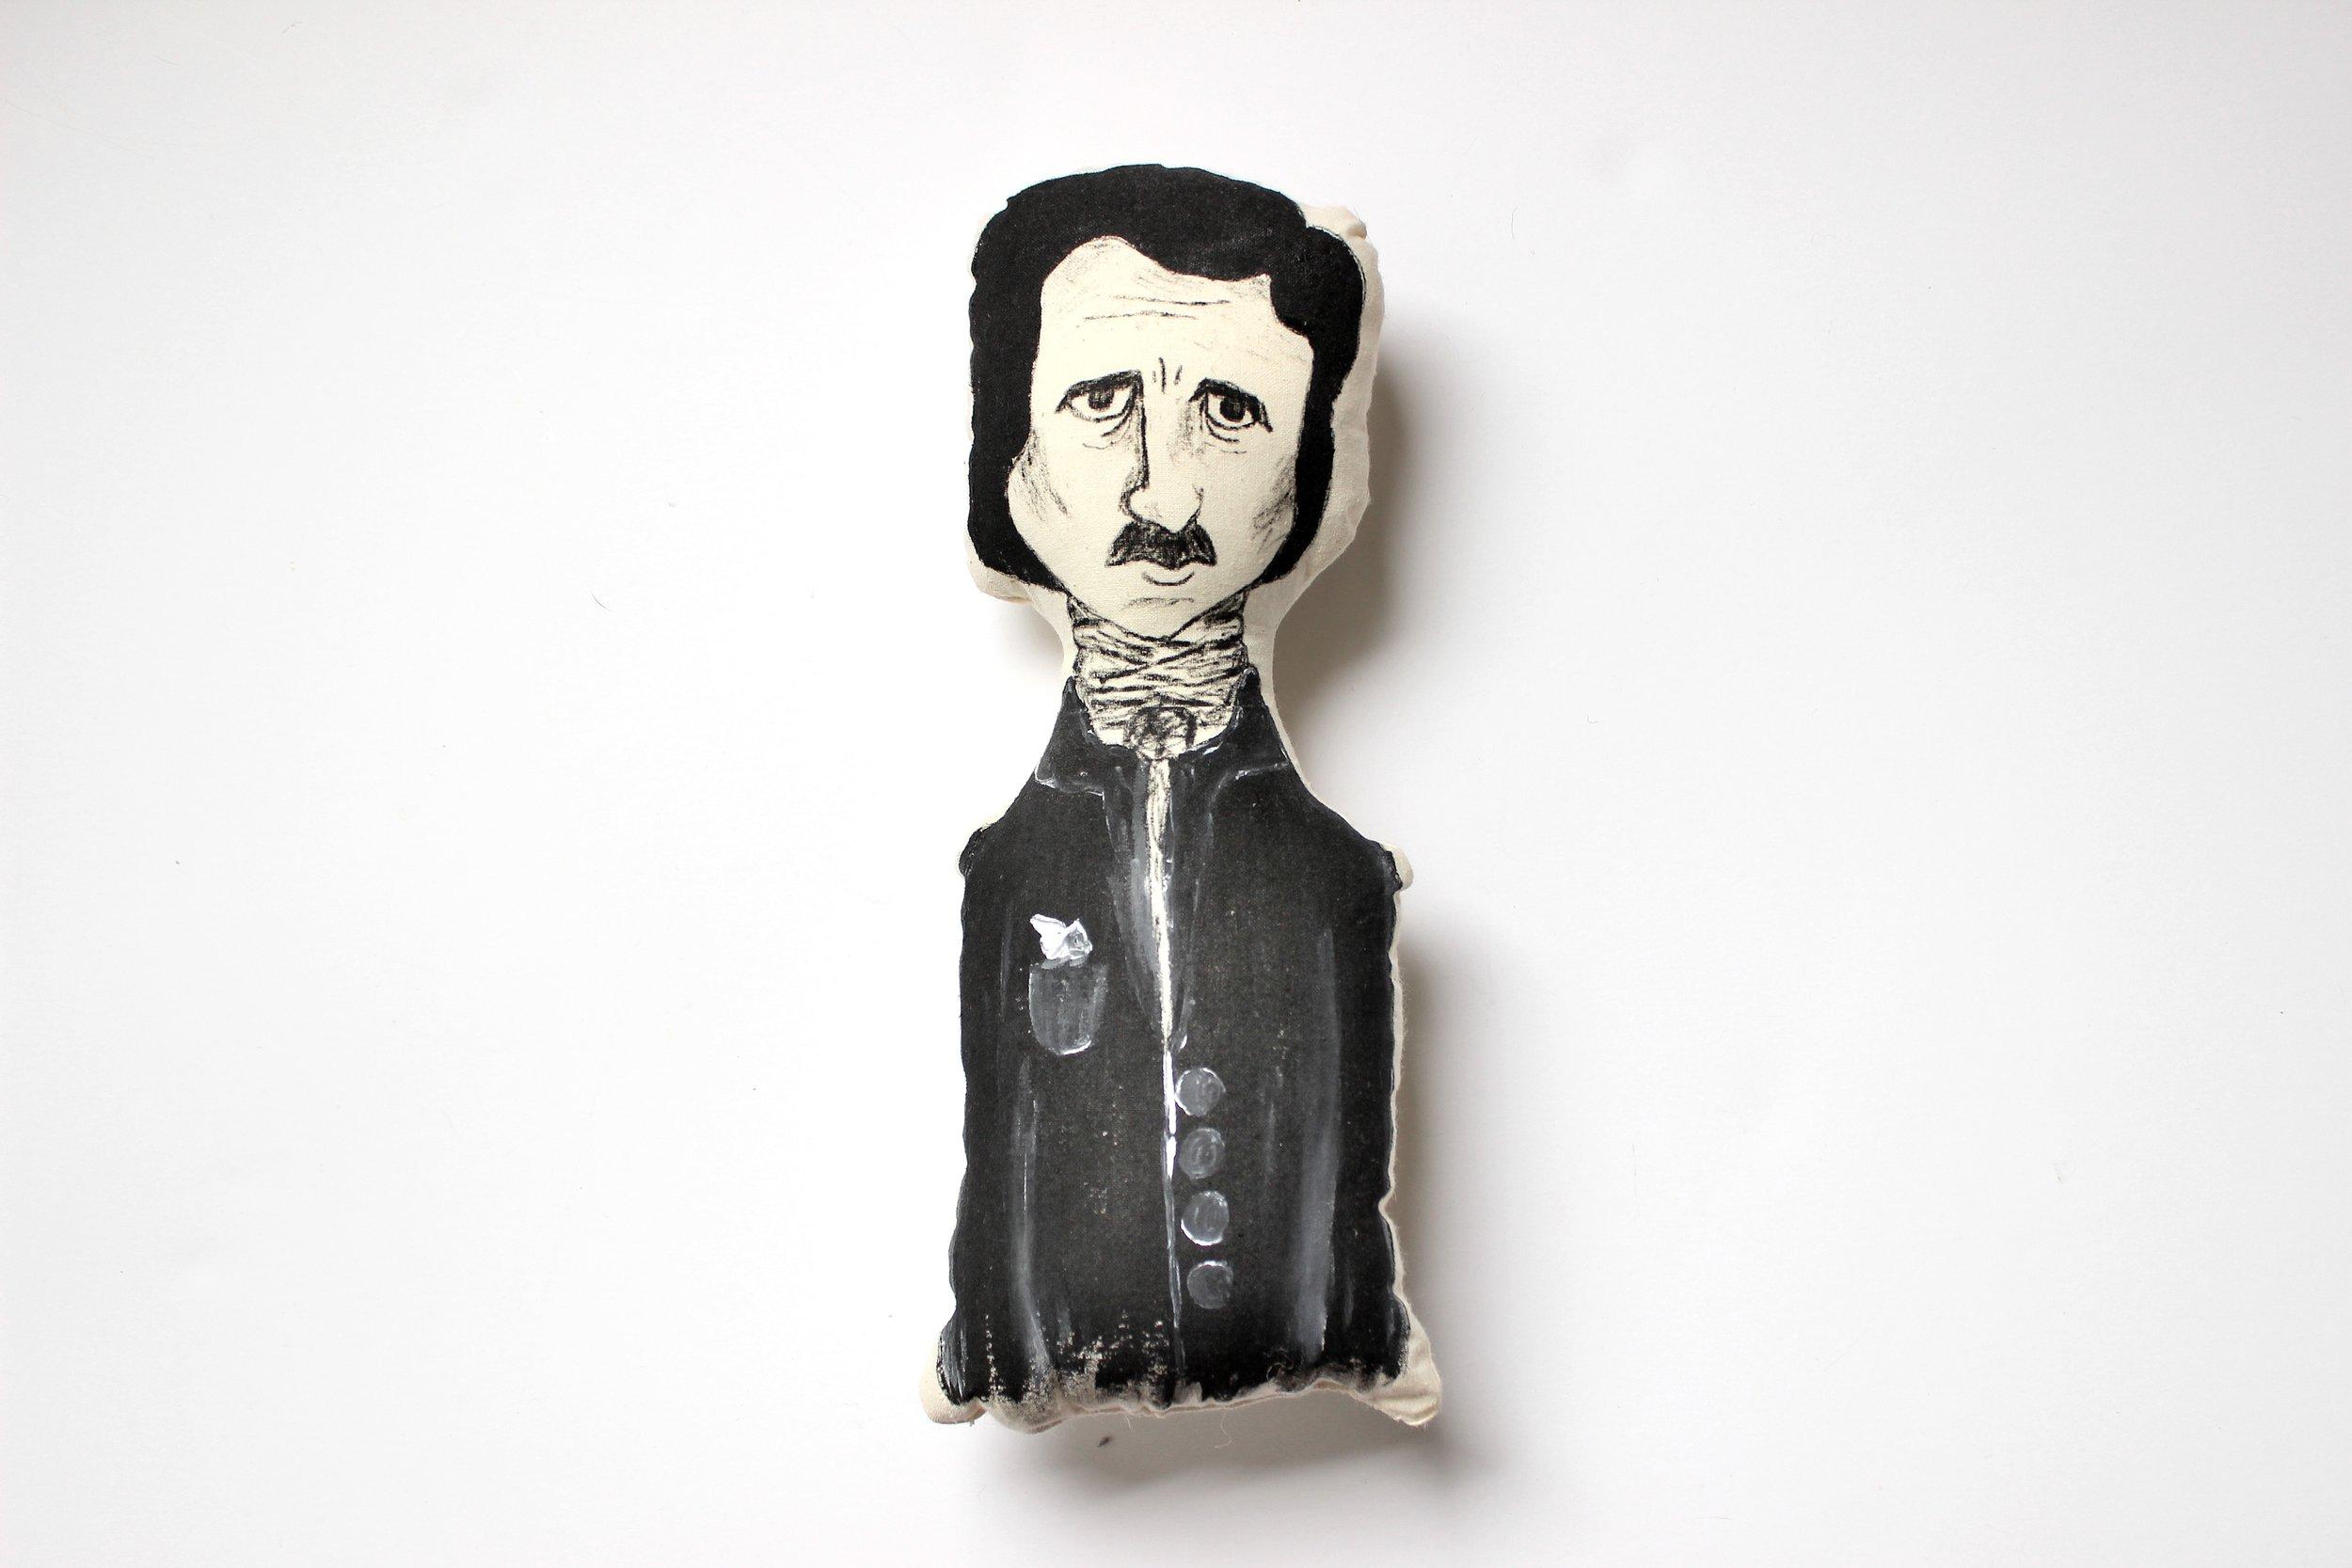 Edgar Allan Poe Doll, $25